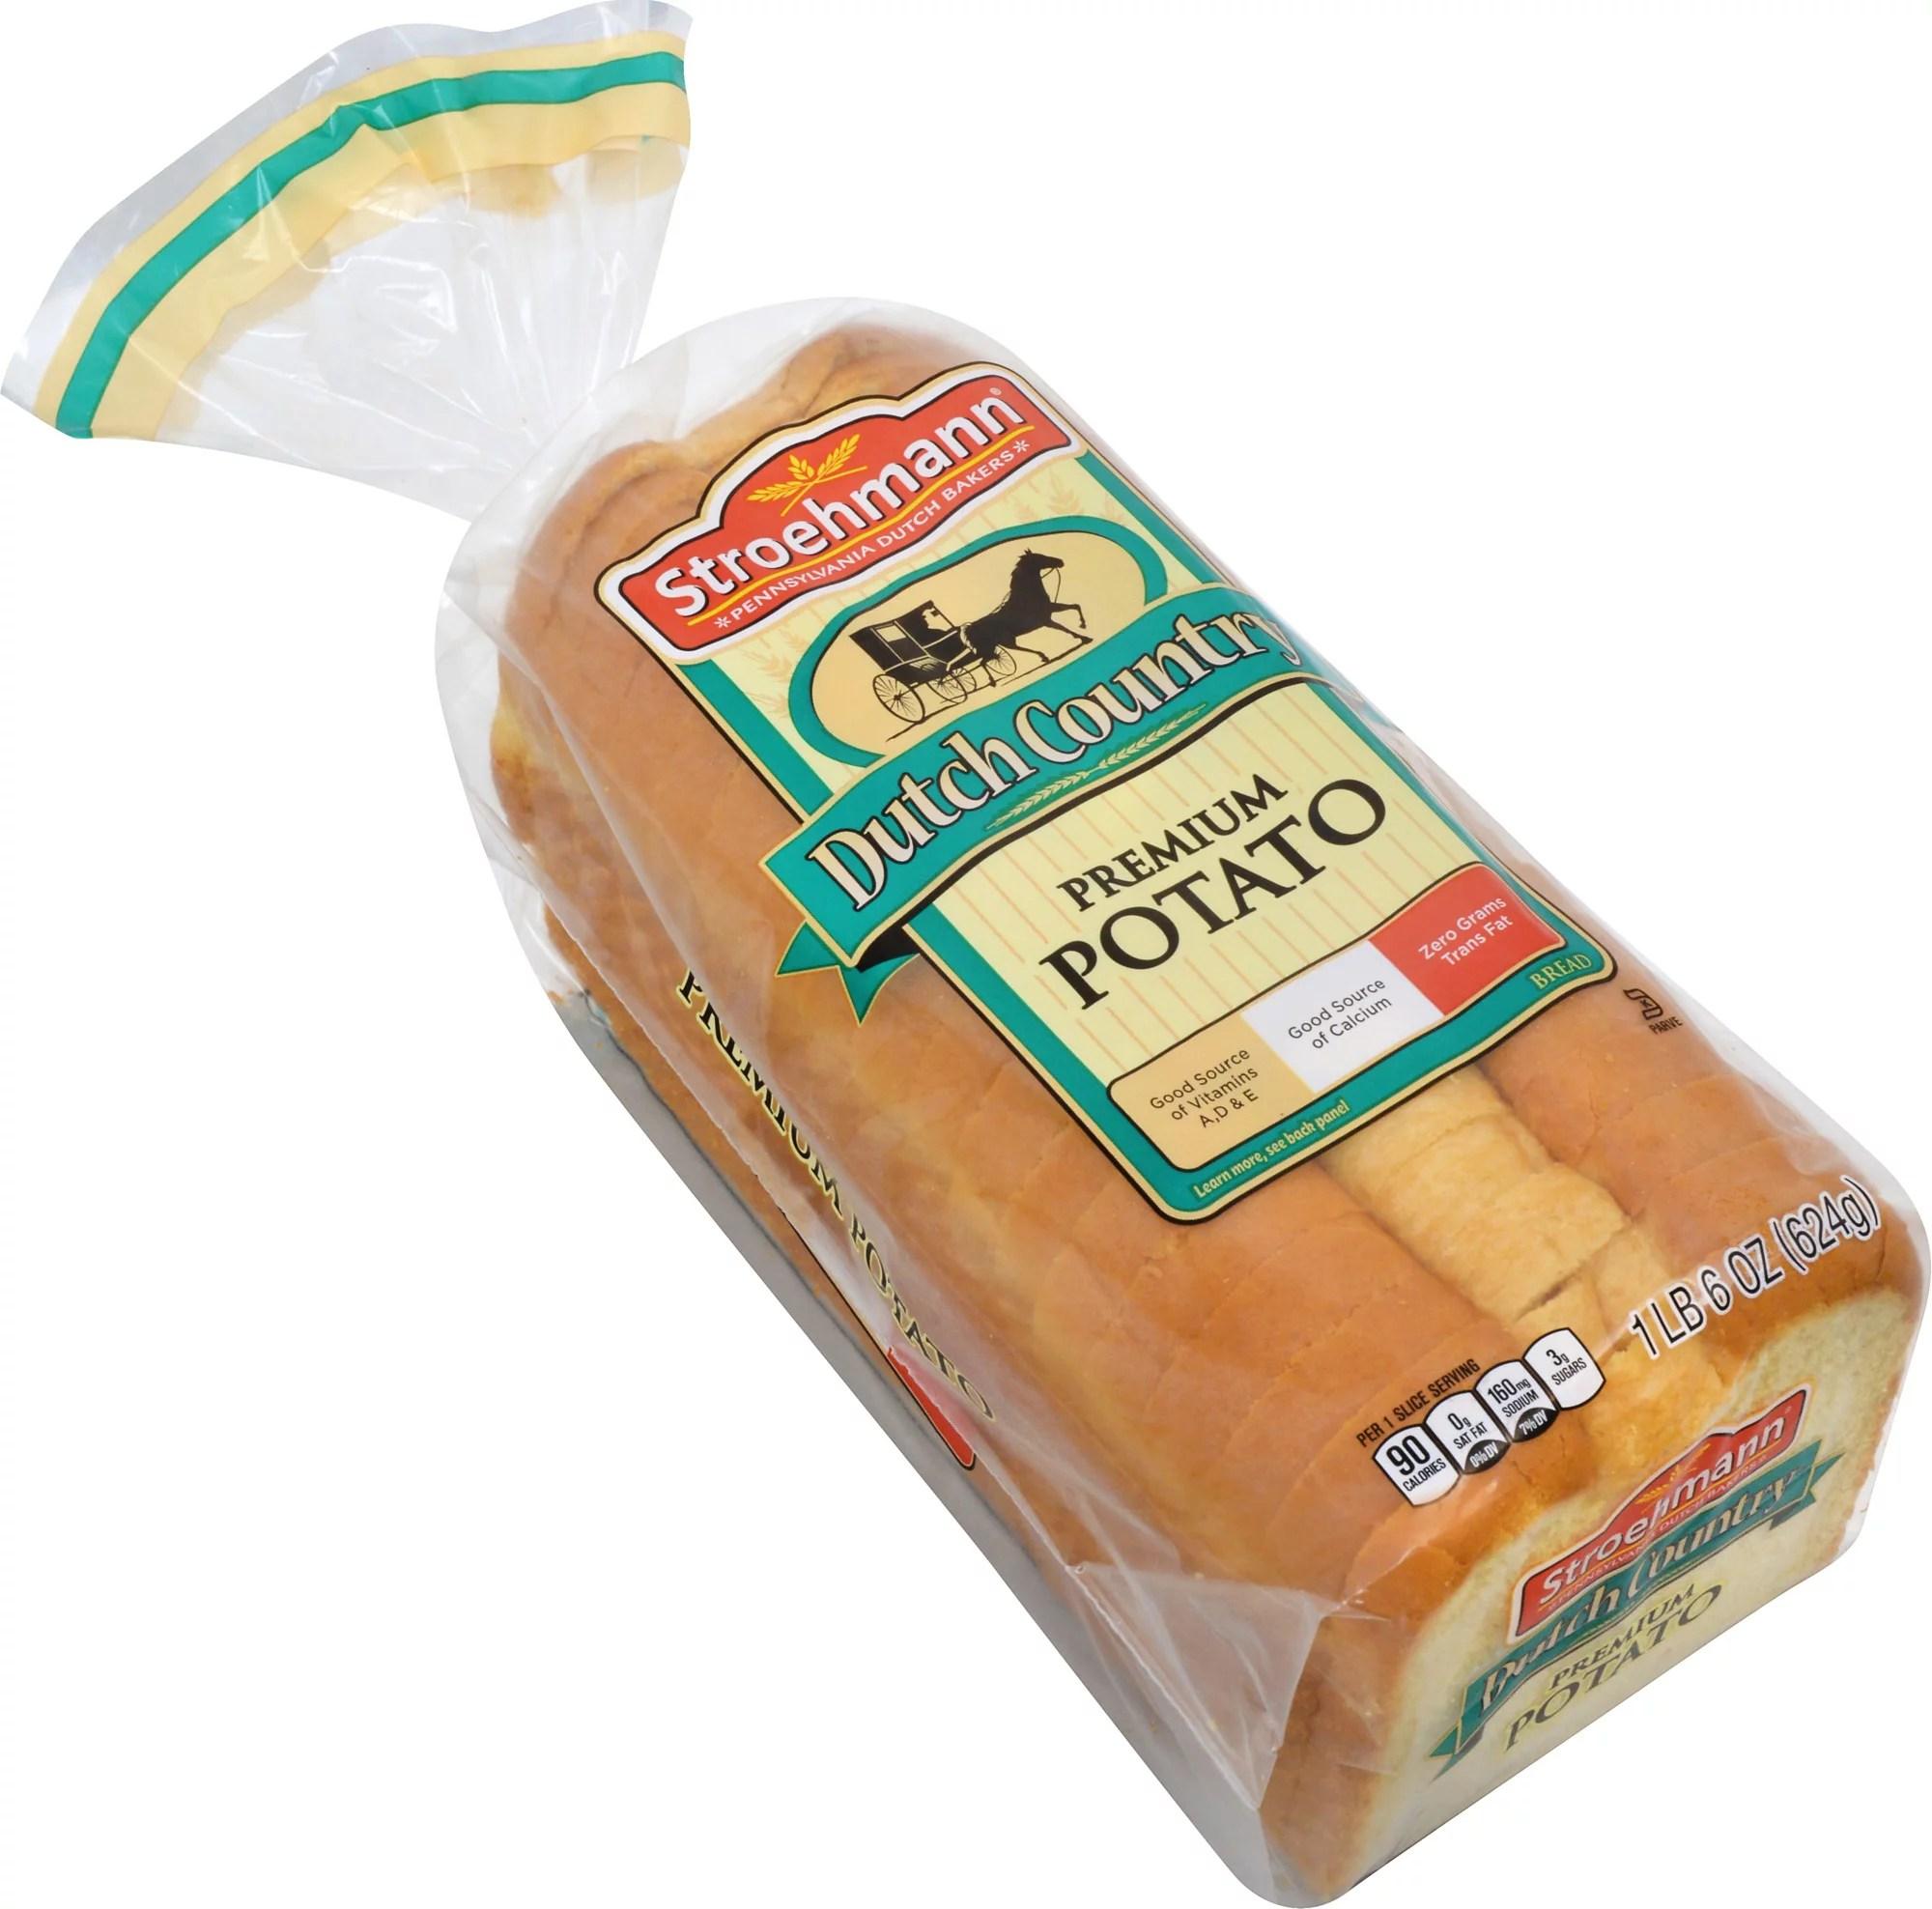 Arnold Premium Potato Bread 22 oz Walmartcom